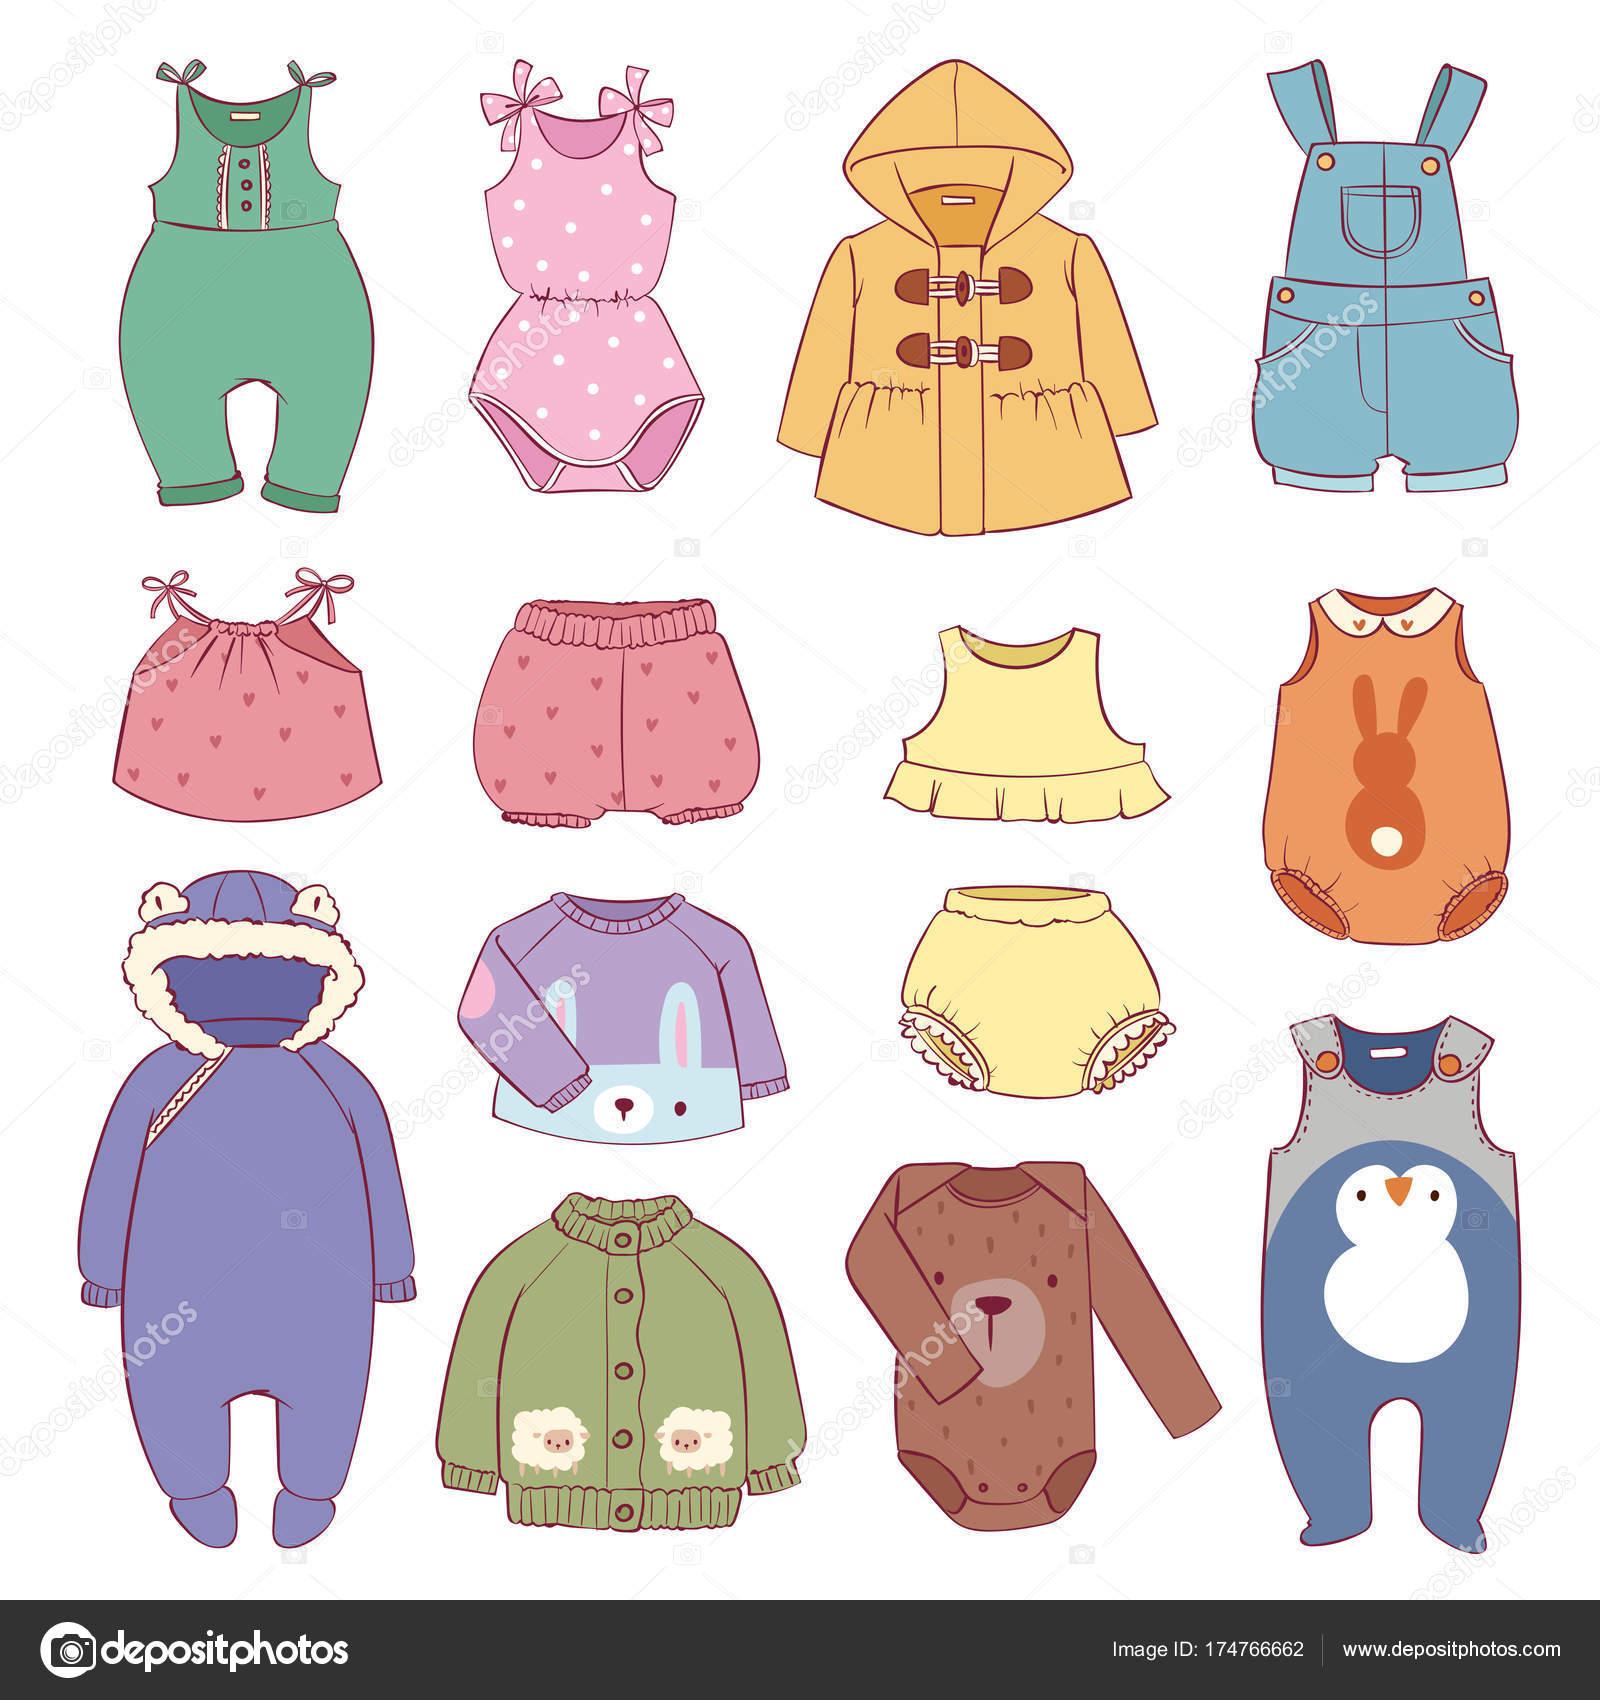 4f678bb4eea Σετ εποχικά βρέφος ρούχα για παιδιά και εικονογράφηση διάνυσμα Βρεφικά  παιδαριώδης πανί Βρεφικά μόδας — Διανυσματικό